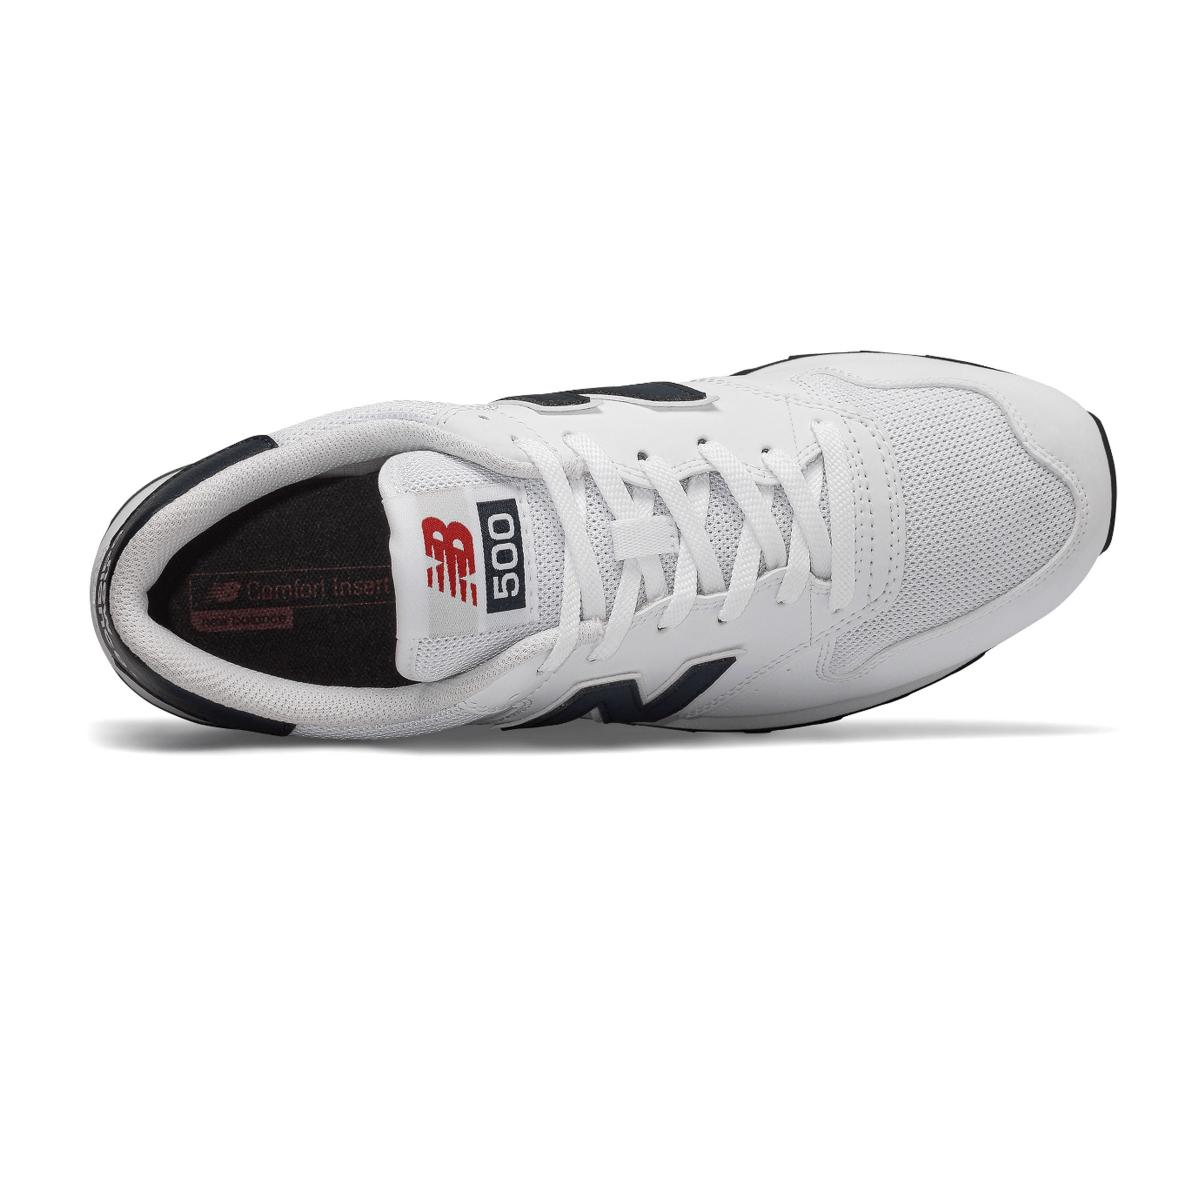 Scarpe Sneakers New Balance da uomo rif. GM500SWB